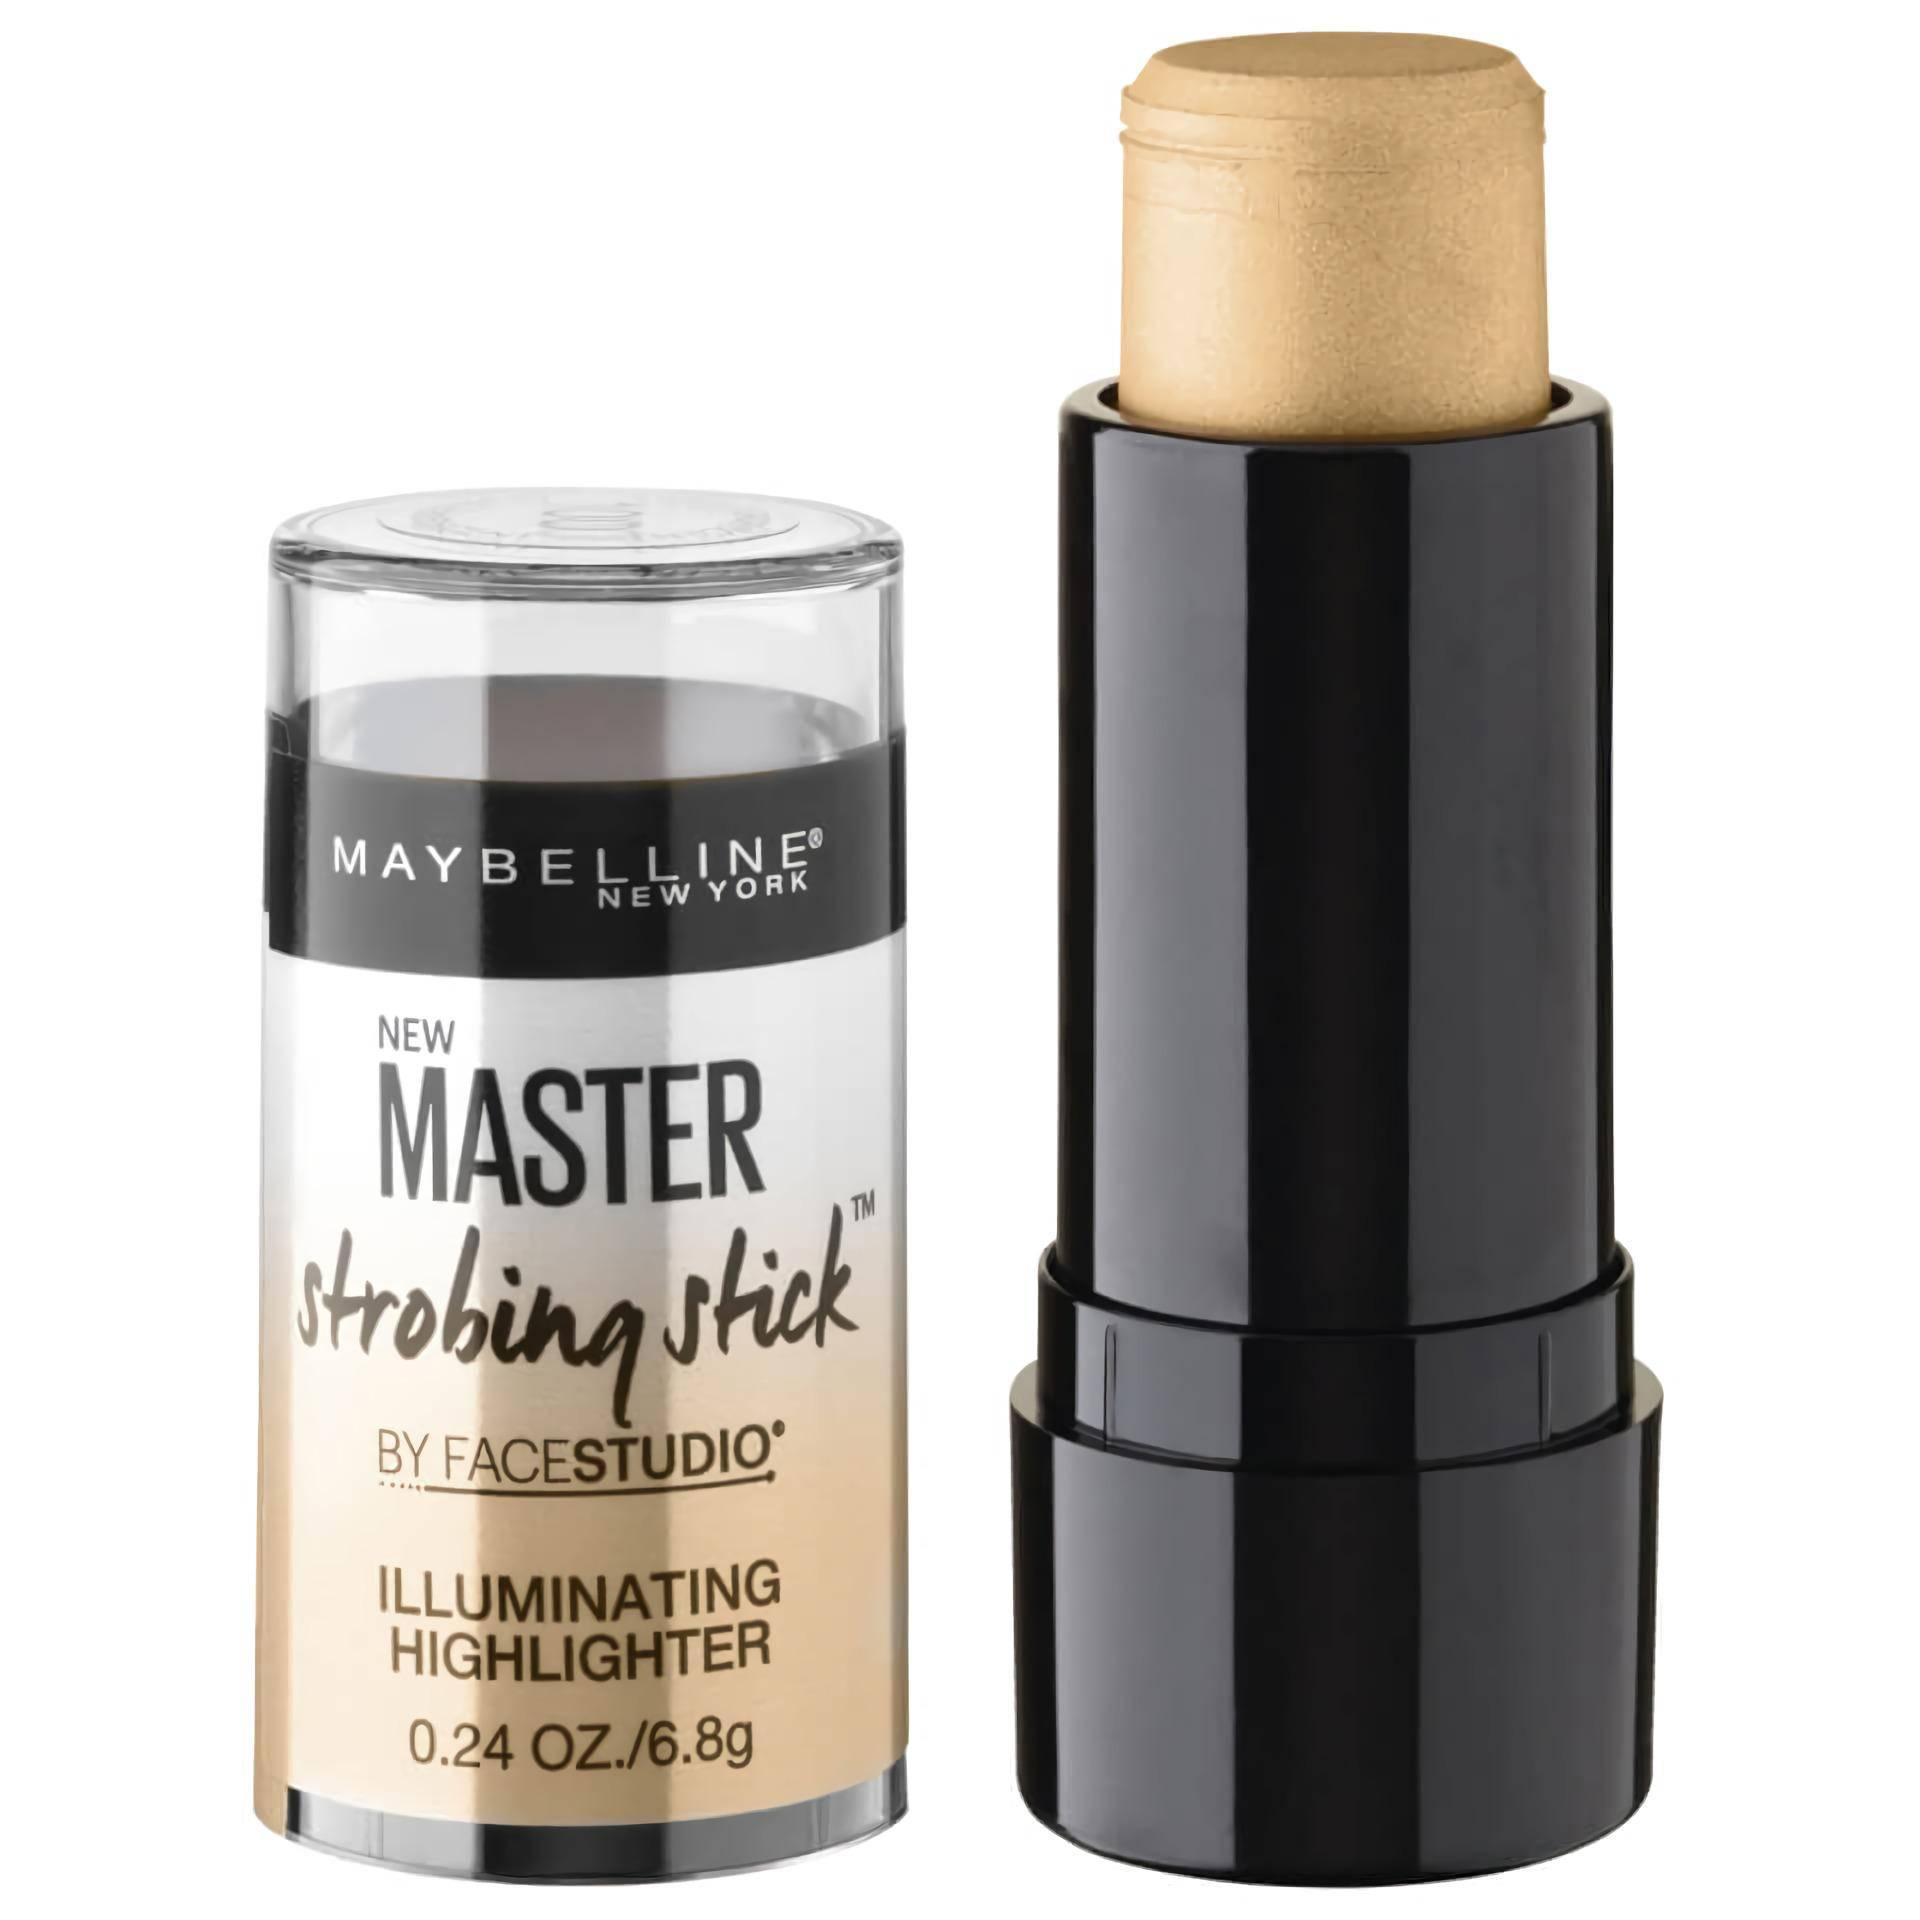 Maybelline New York By Face Studio Master Strobing Stick